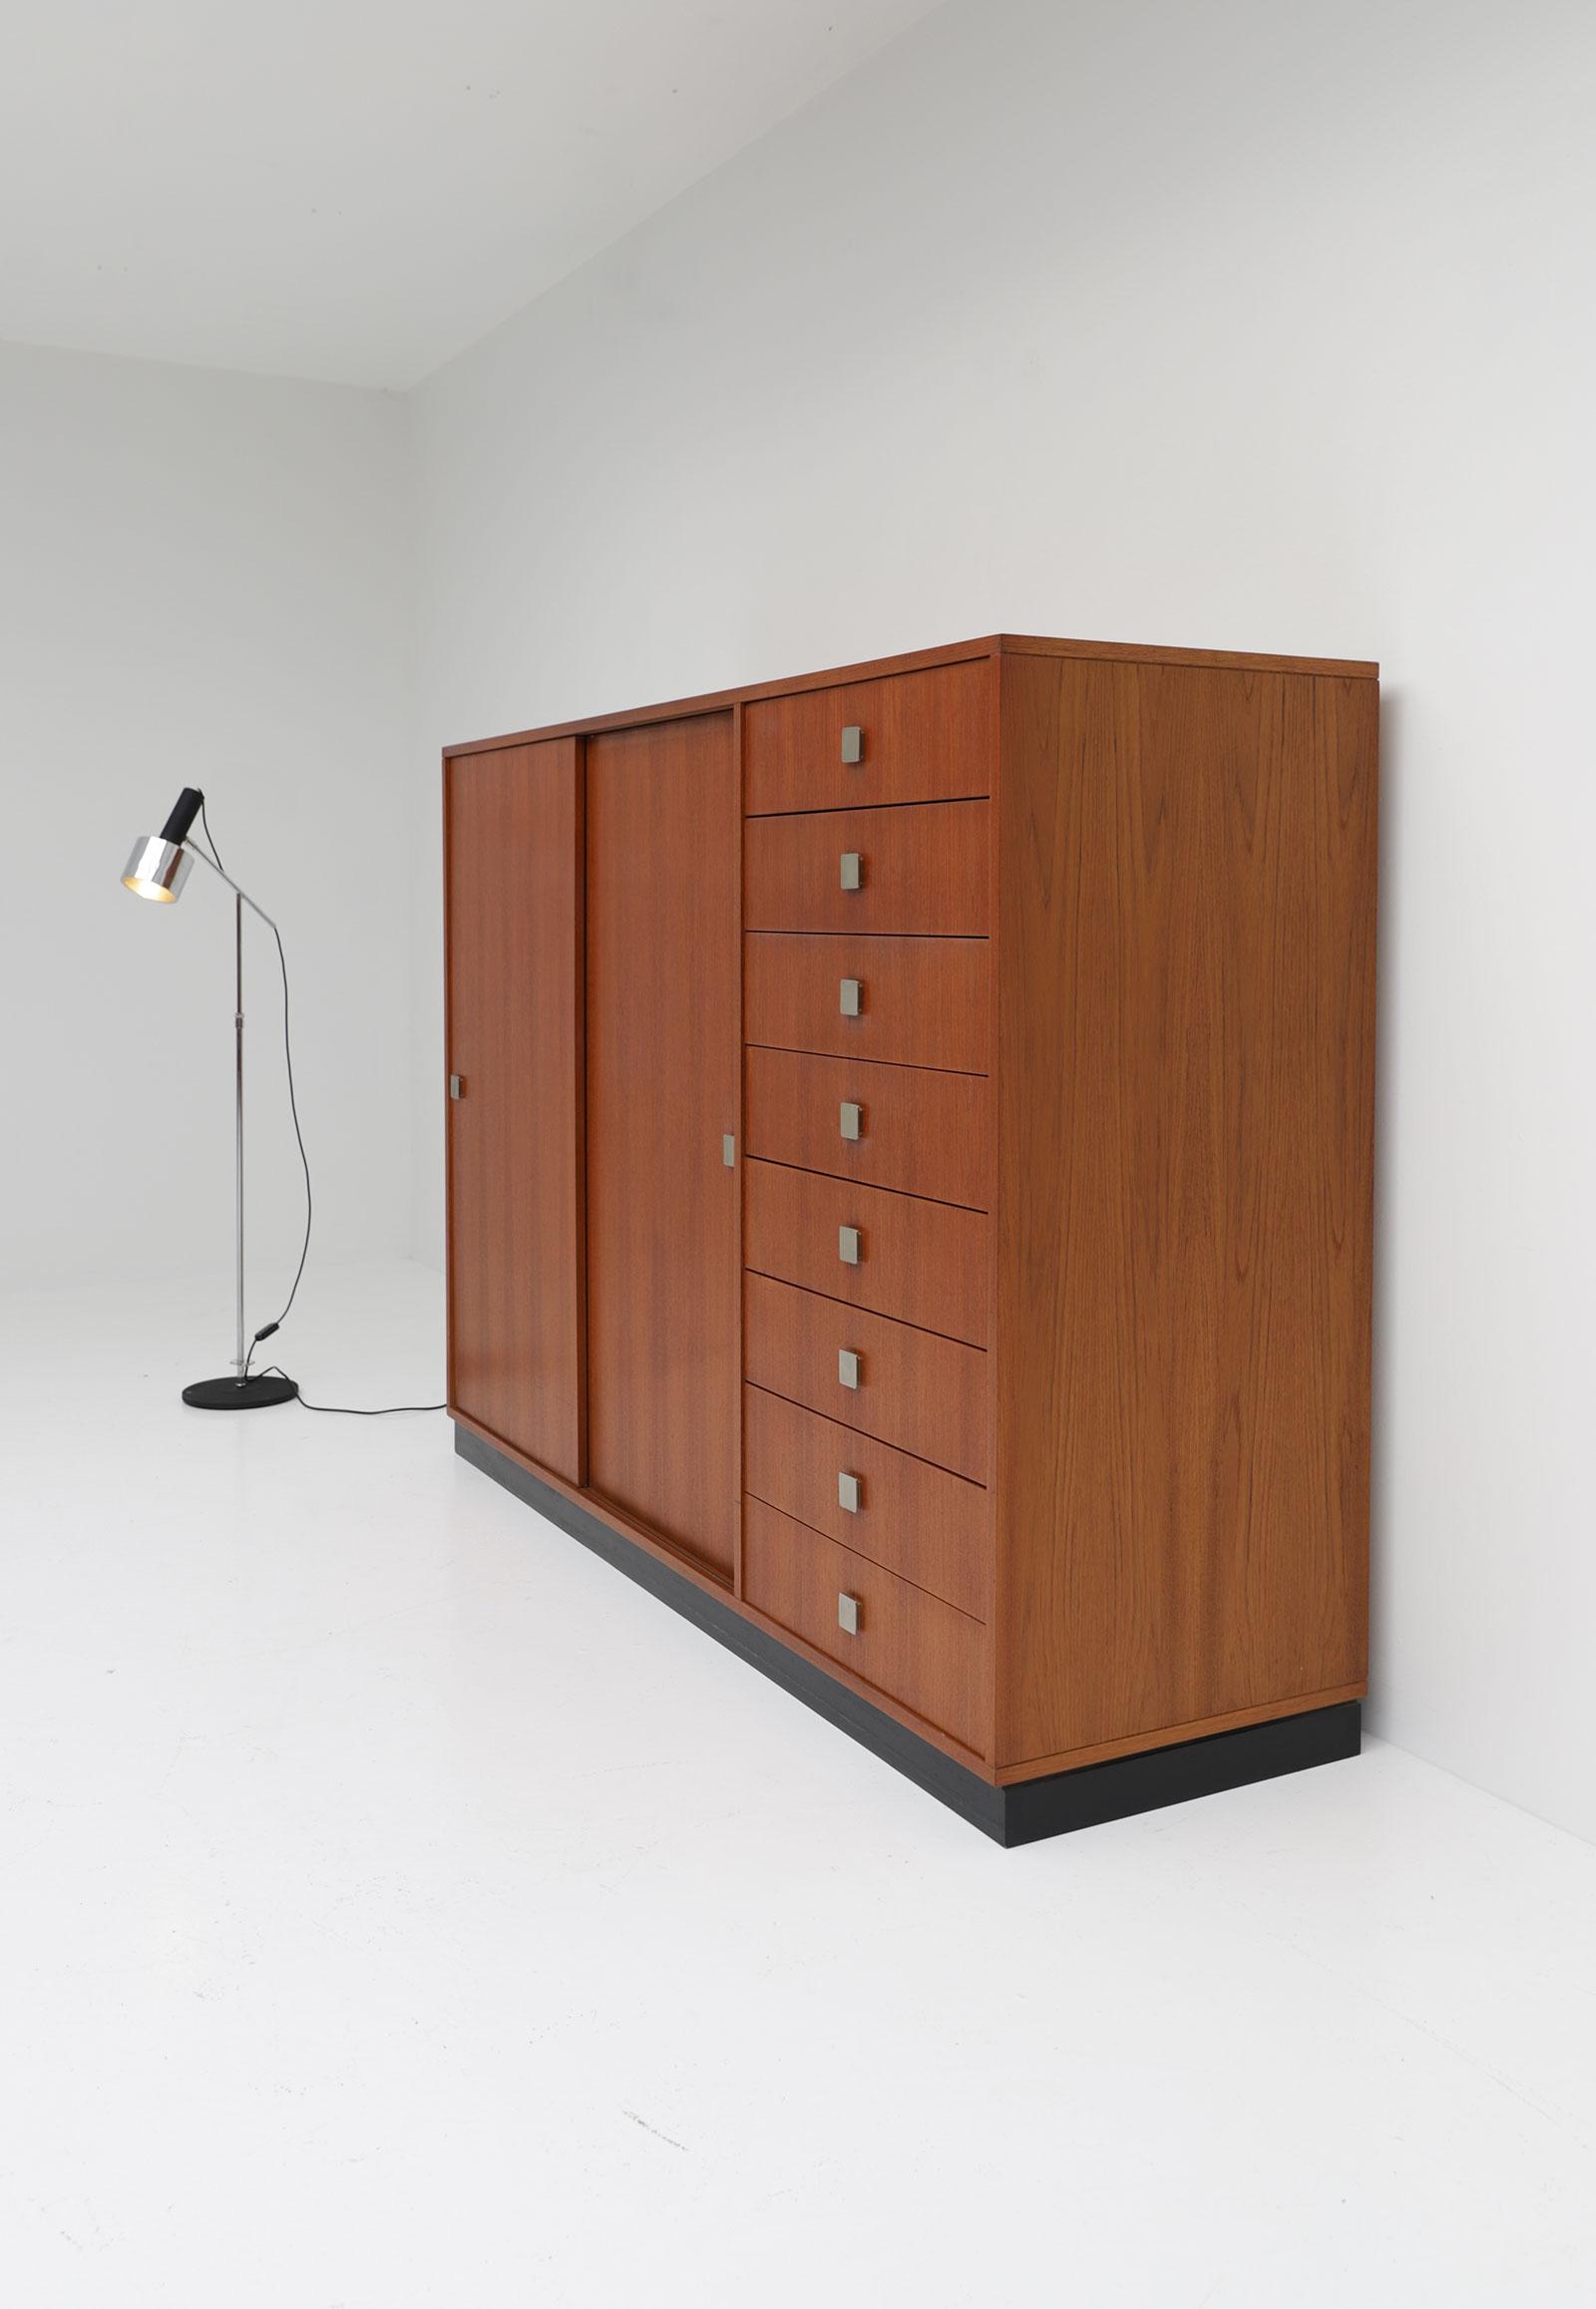 1960s Alfred Hendrickx for Belform Wardrobe